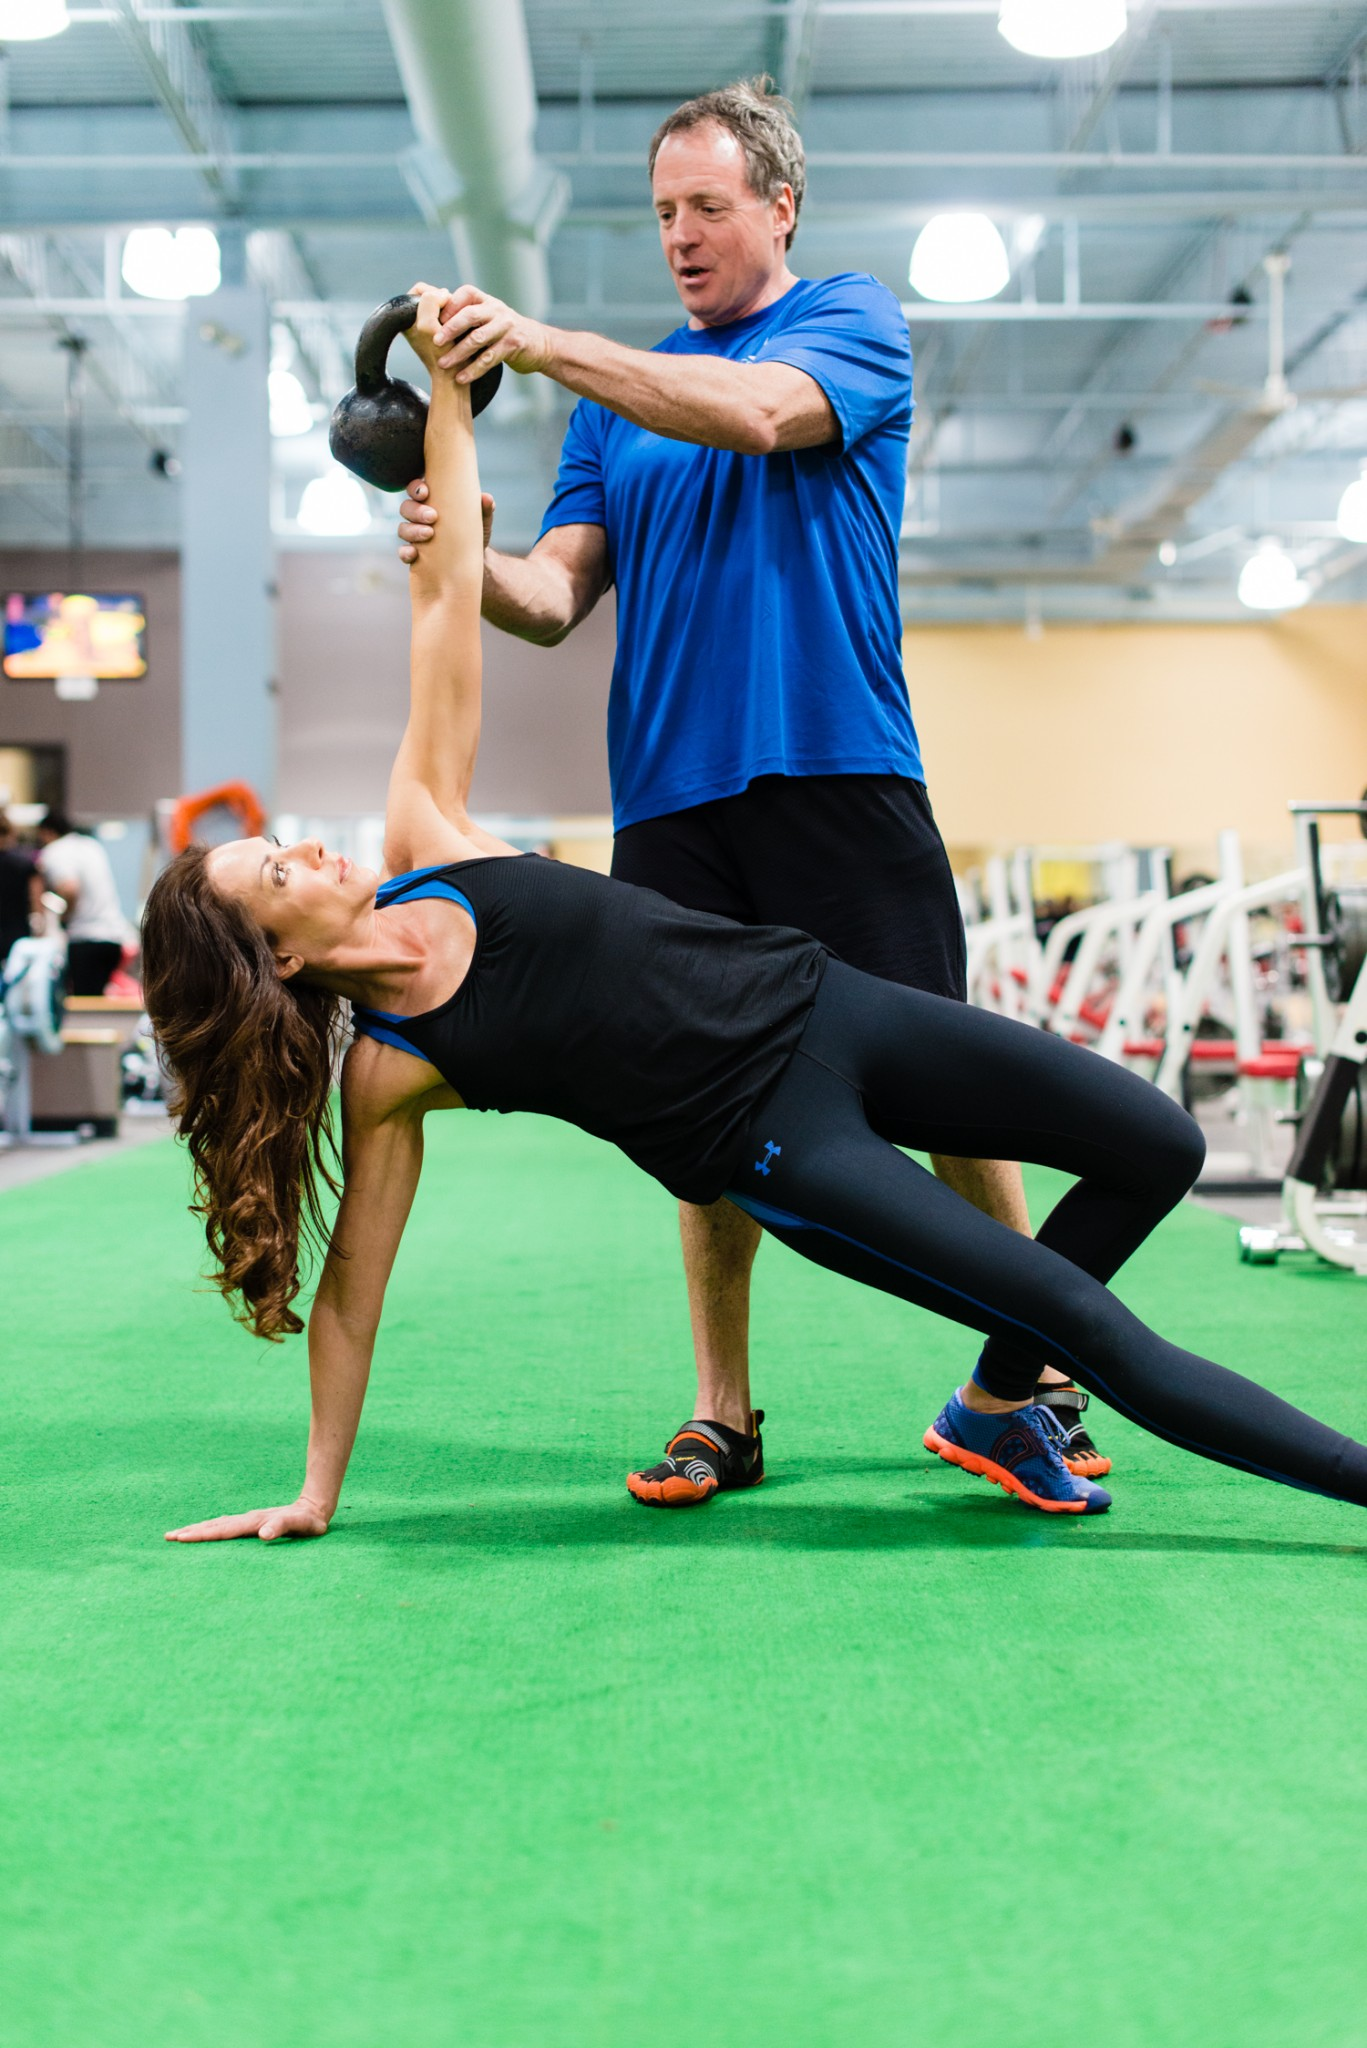 Adult Fitness Training  cccec6c27